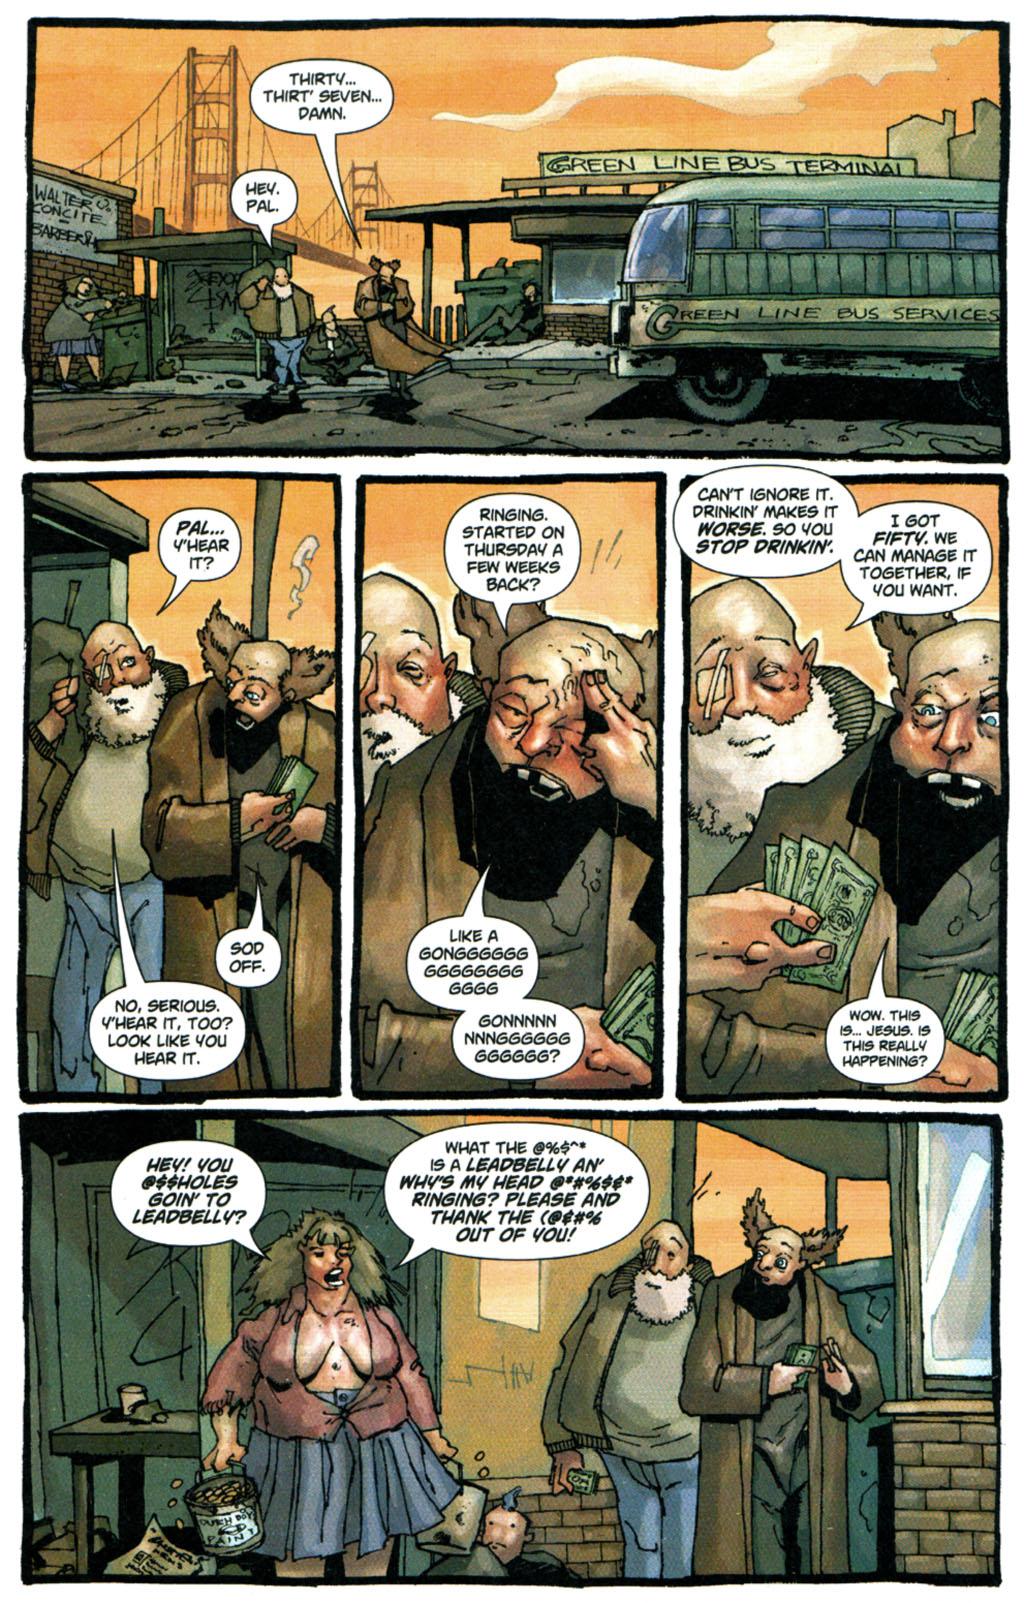 Read online Enginehead comic -  Issue #5 - 15